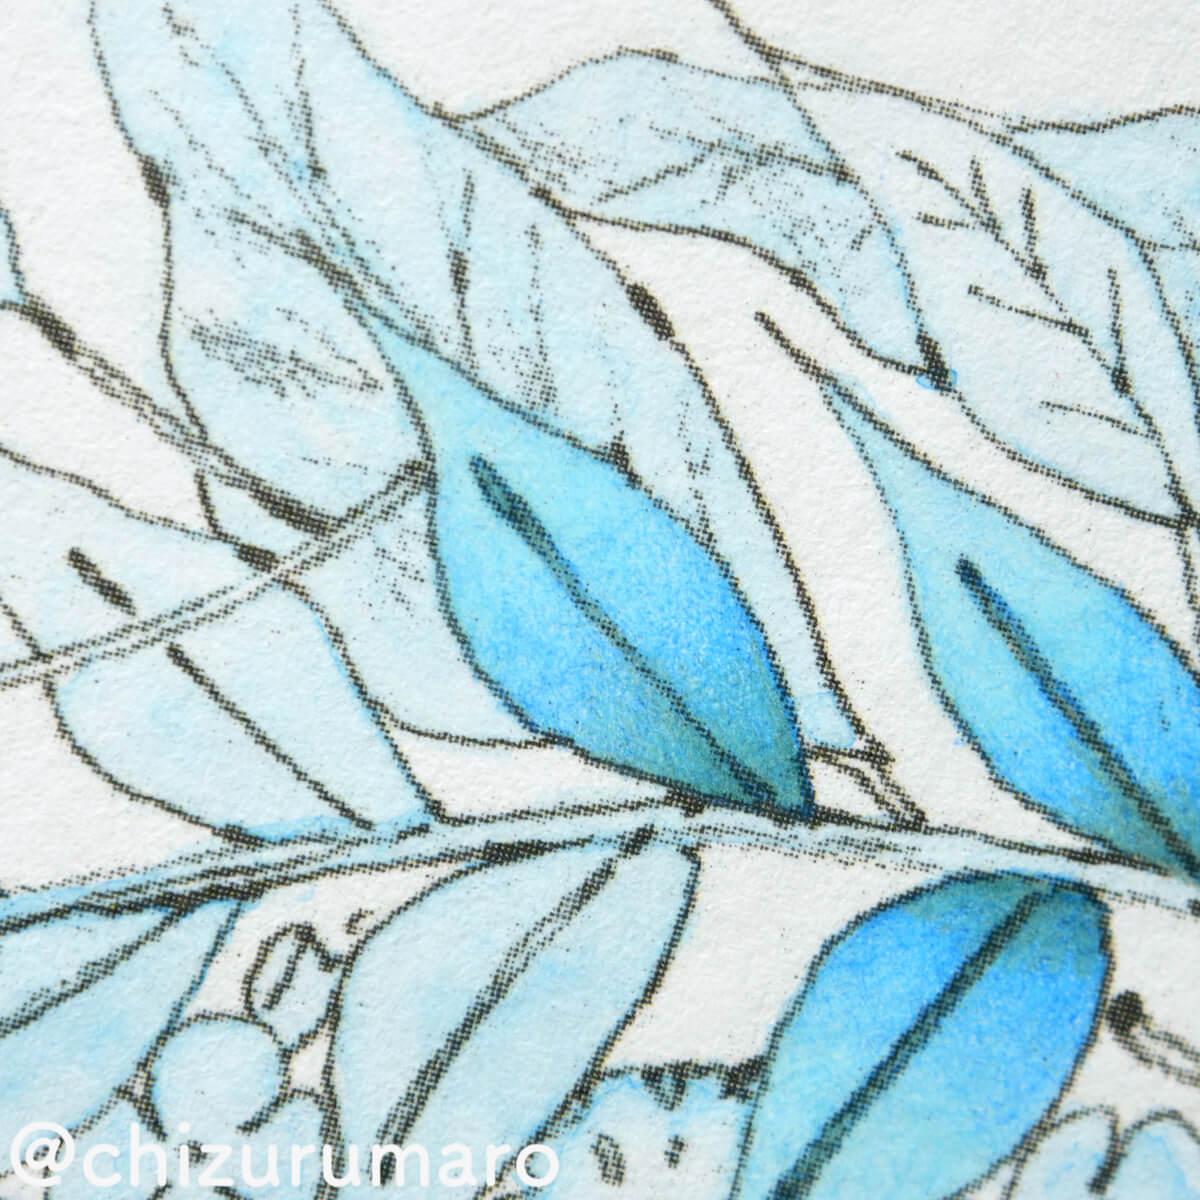 f:id:chizurumaro:20210413165530j:plain